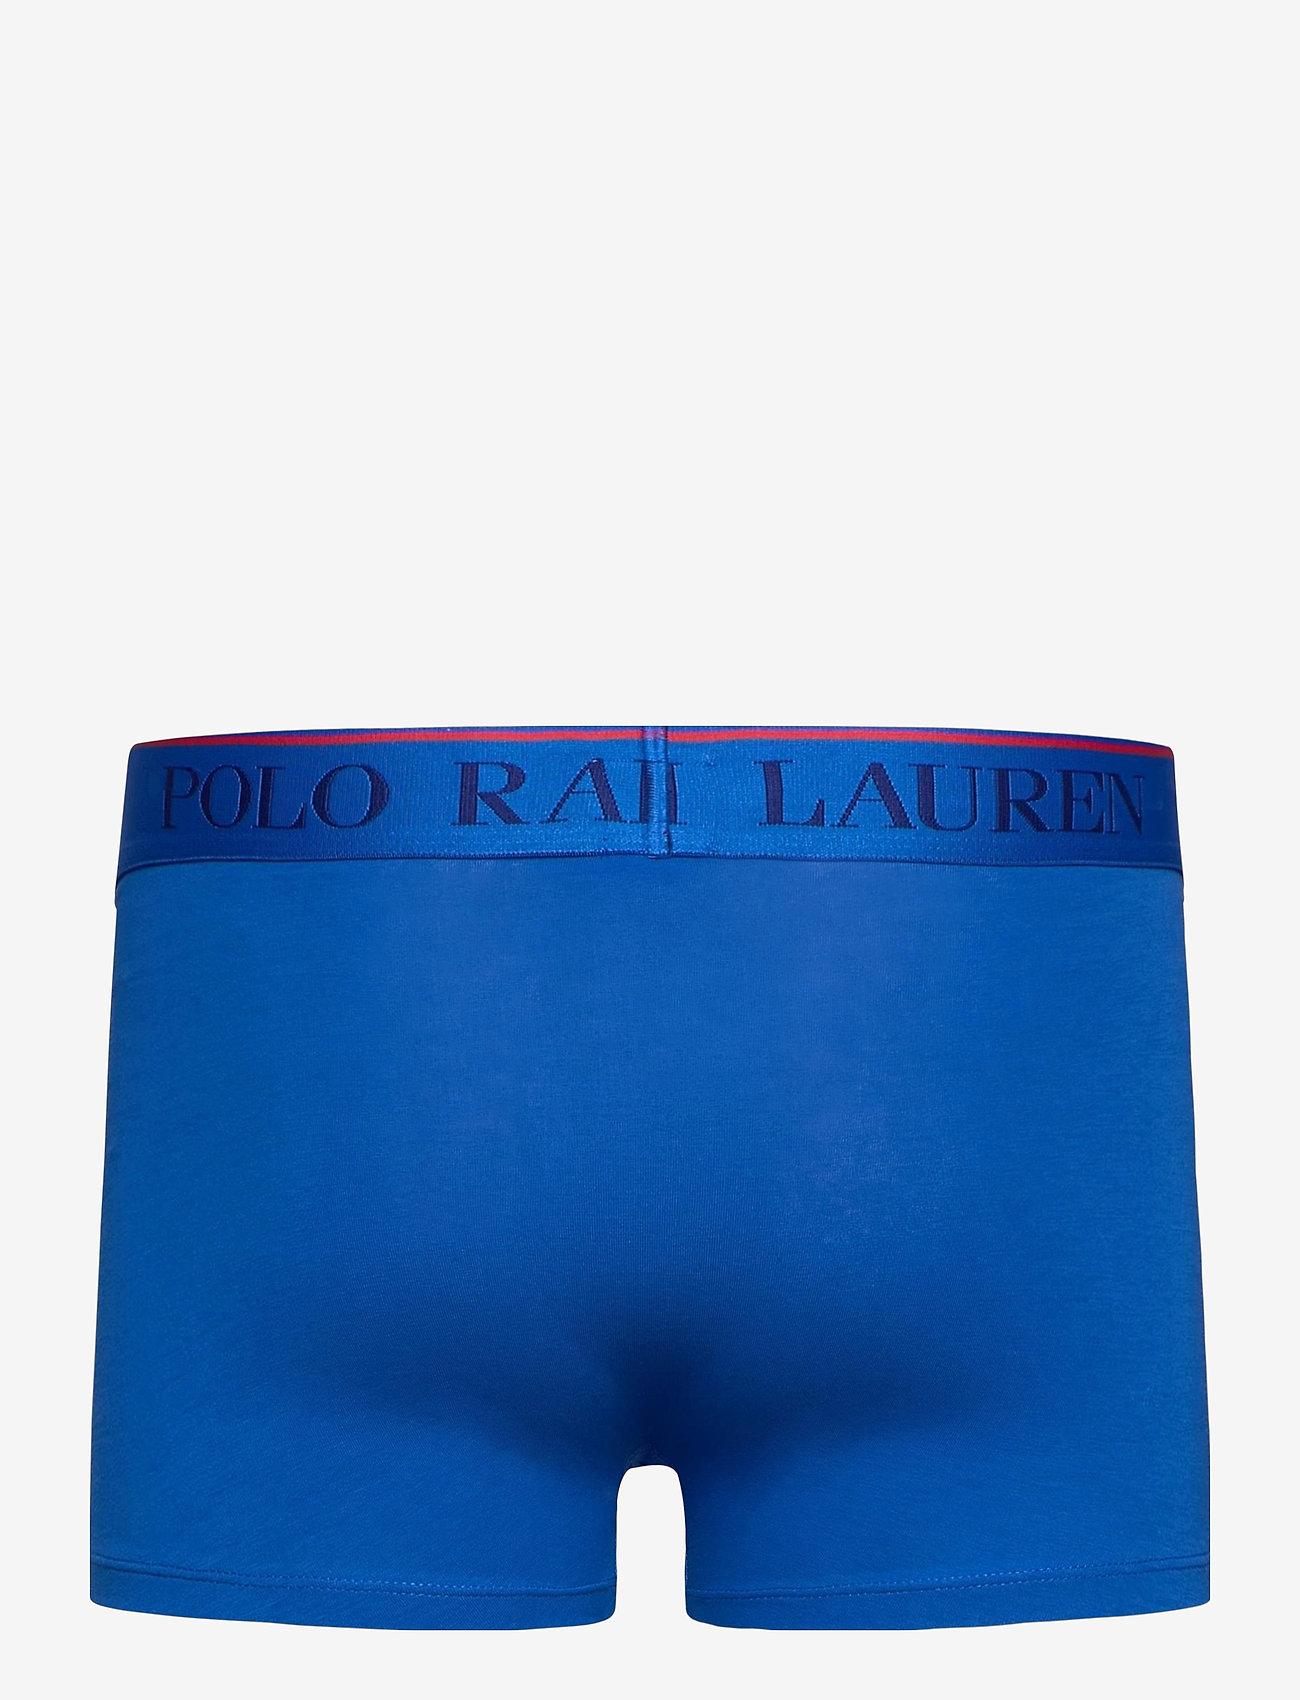 Polo Ralph Lauren Underwear - Stretch Cotton Trunk - boxers - heritage blue - 1